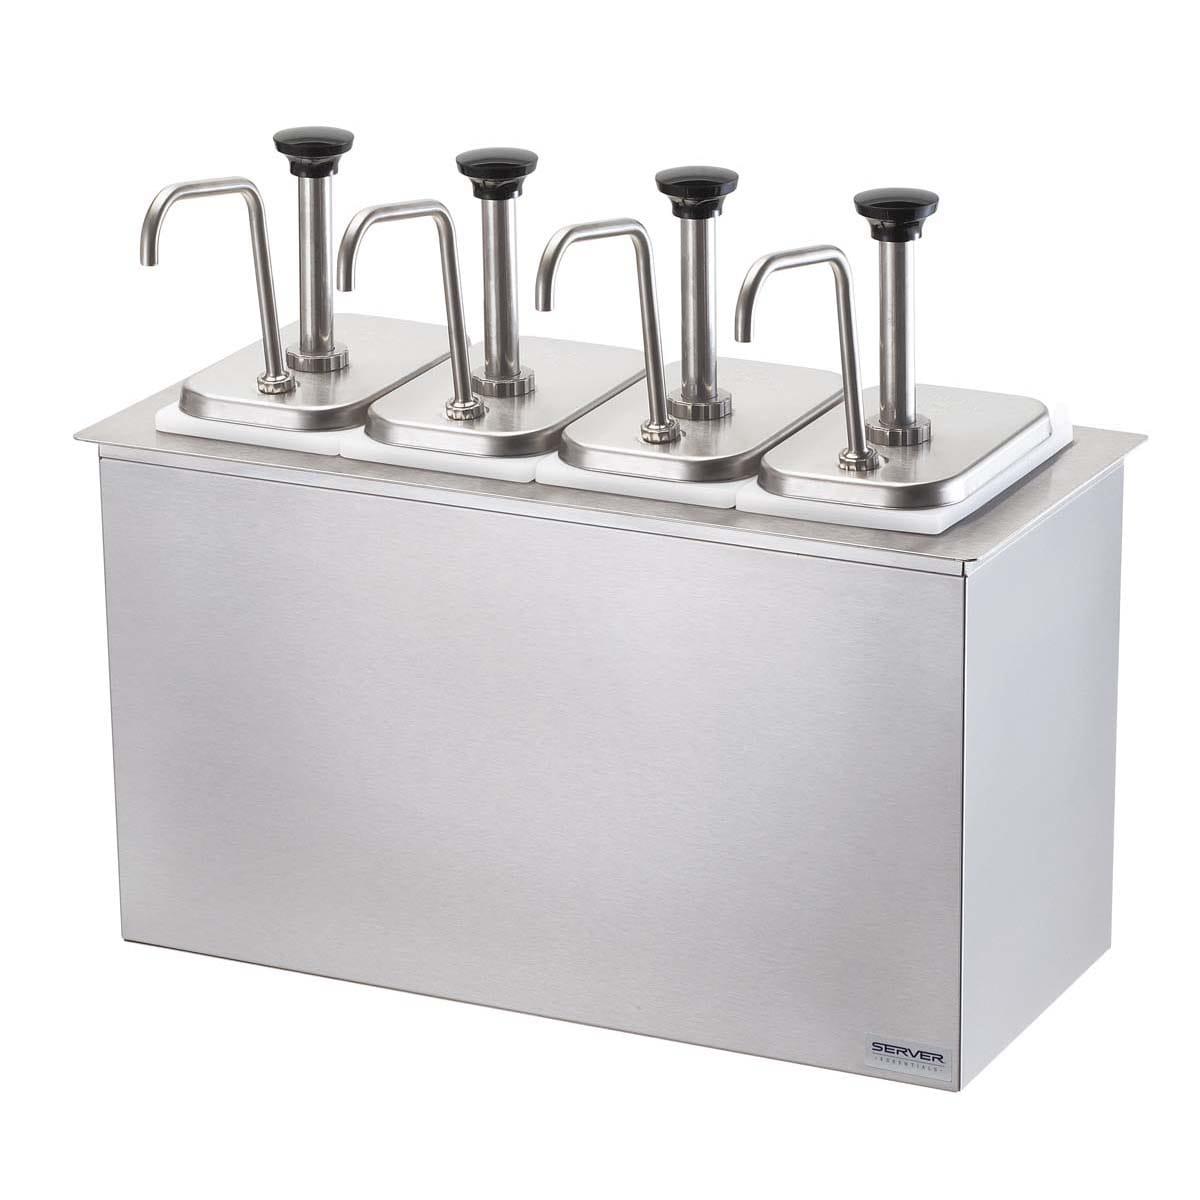 Server 83720 Pump Style Condiment Dispenser w/ (4) 1.25-oz/Stroke, Stainless